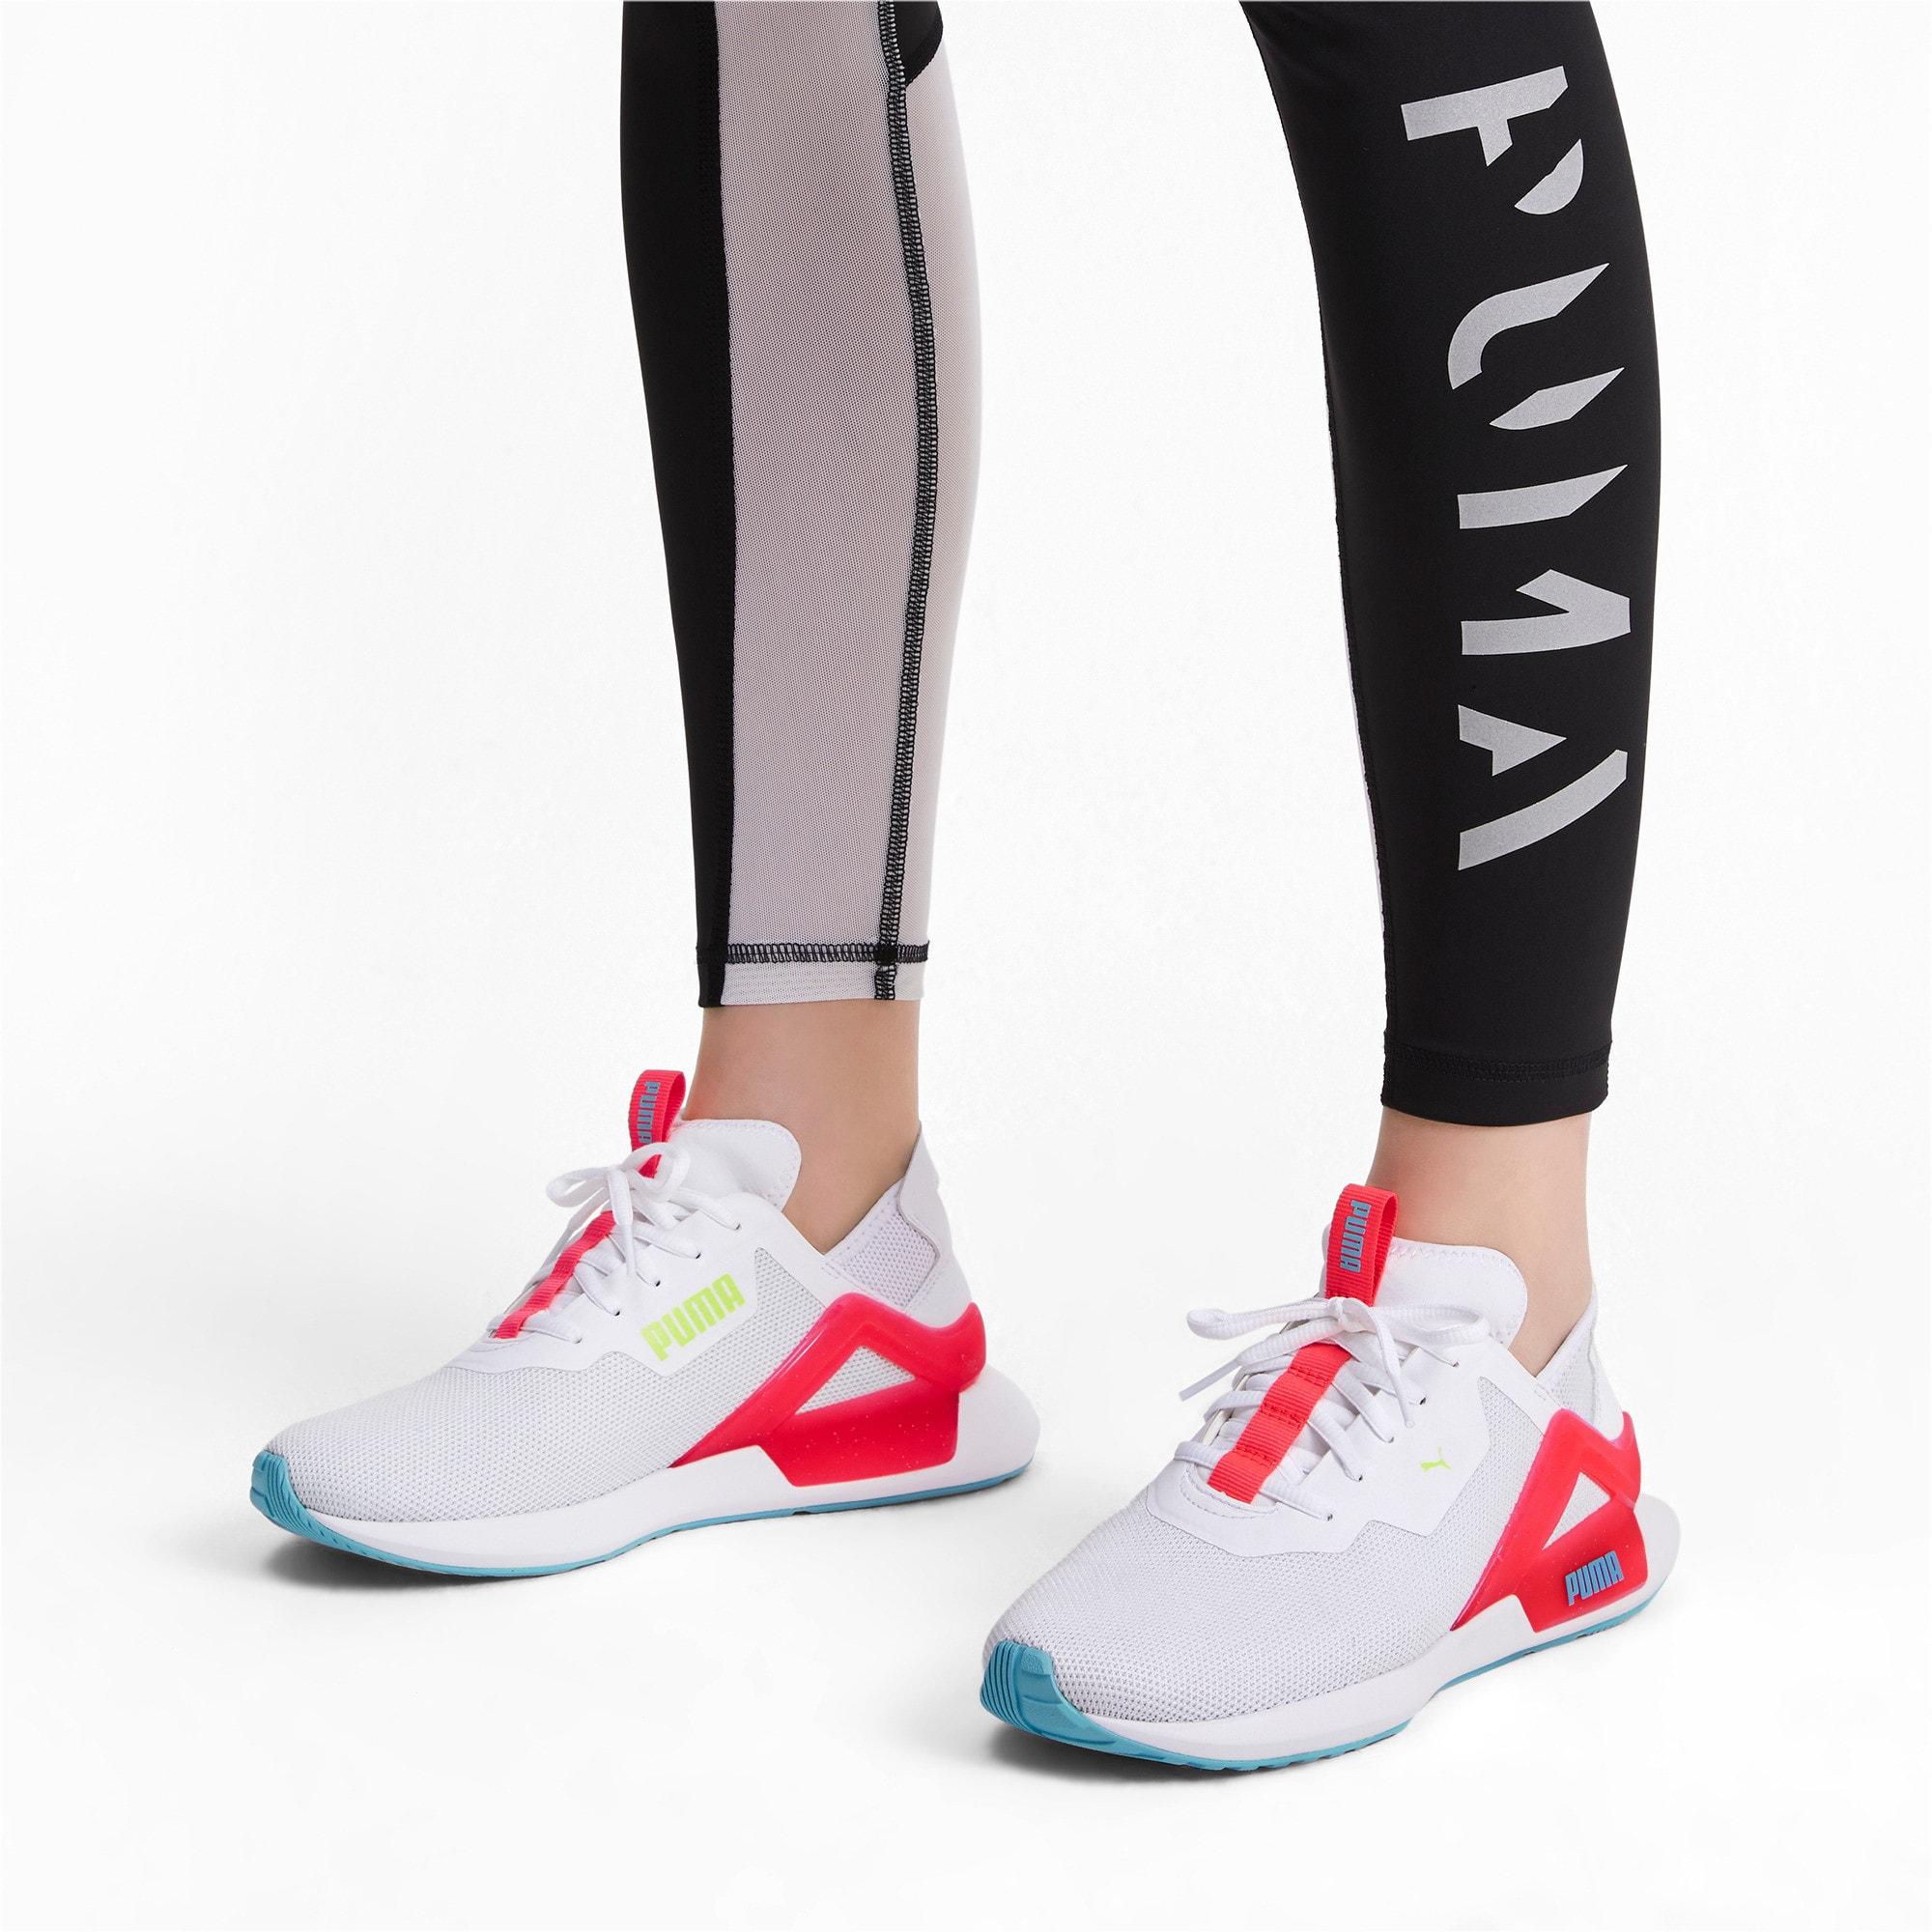 Thumbnail 3 of Rogue X Knit Women's Running Shoes, Puma White-Pink Alert, medium-IND